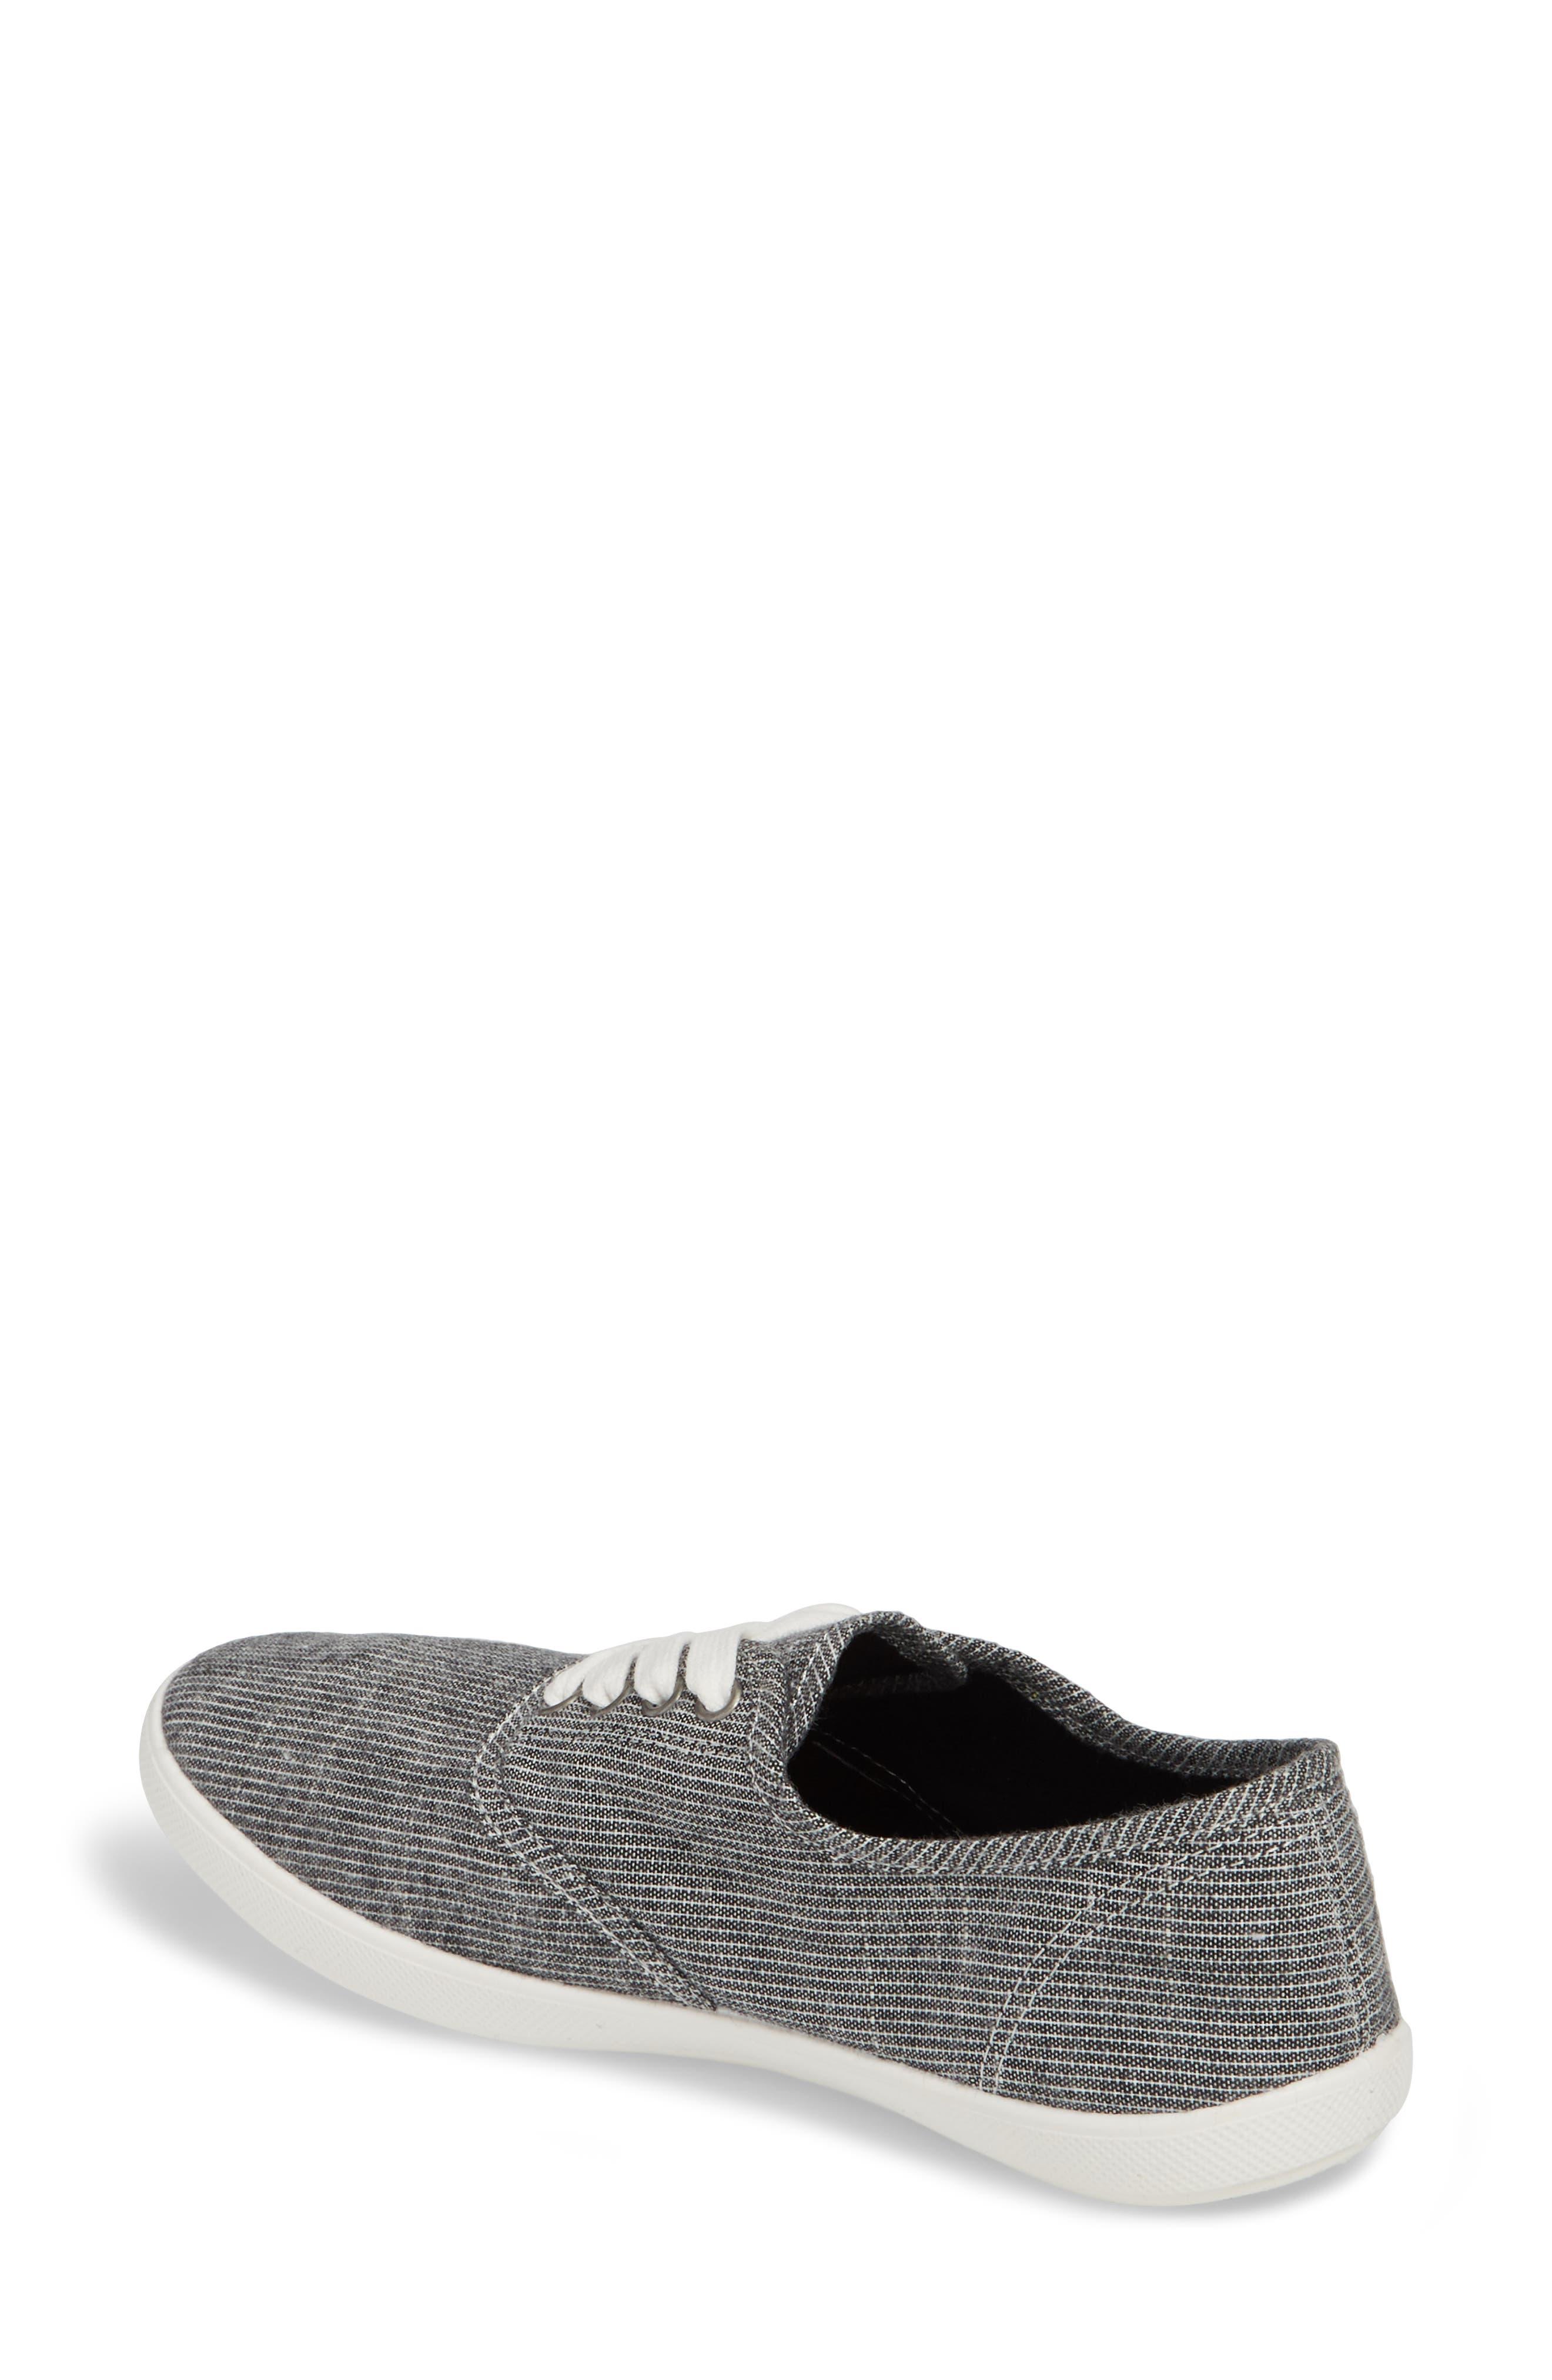 Addy Sneaker,                             Alternate thumbnail 2, color,                             Black/ White